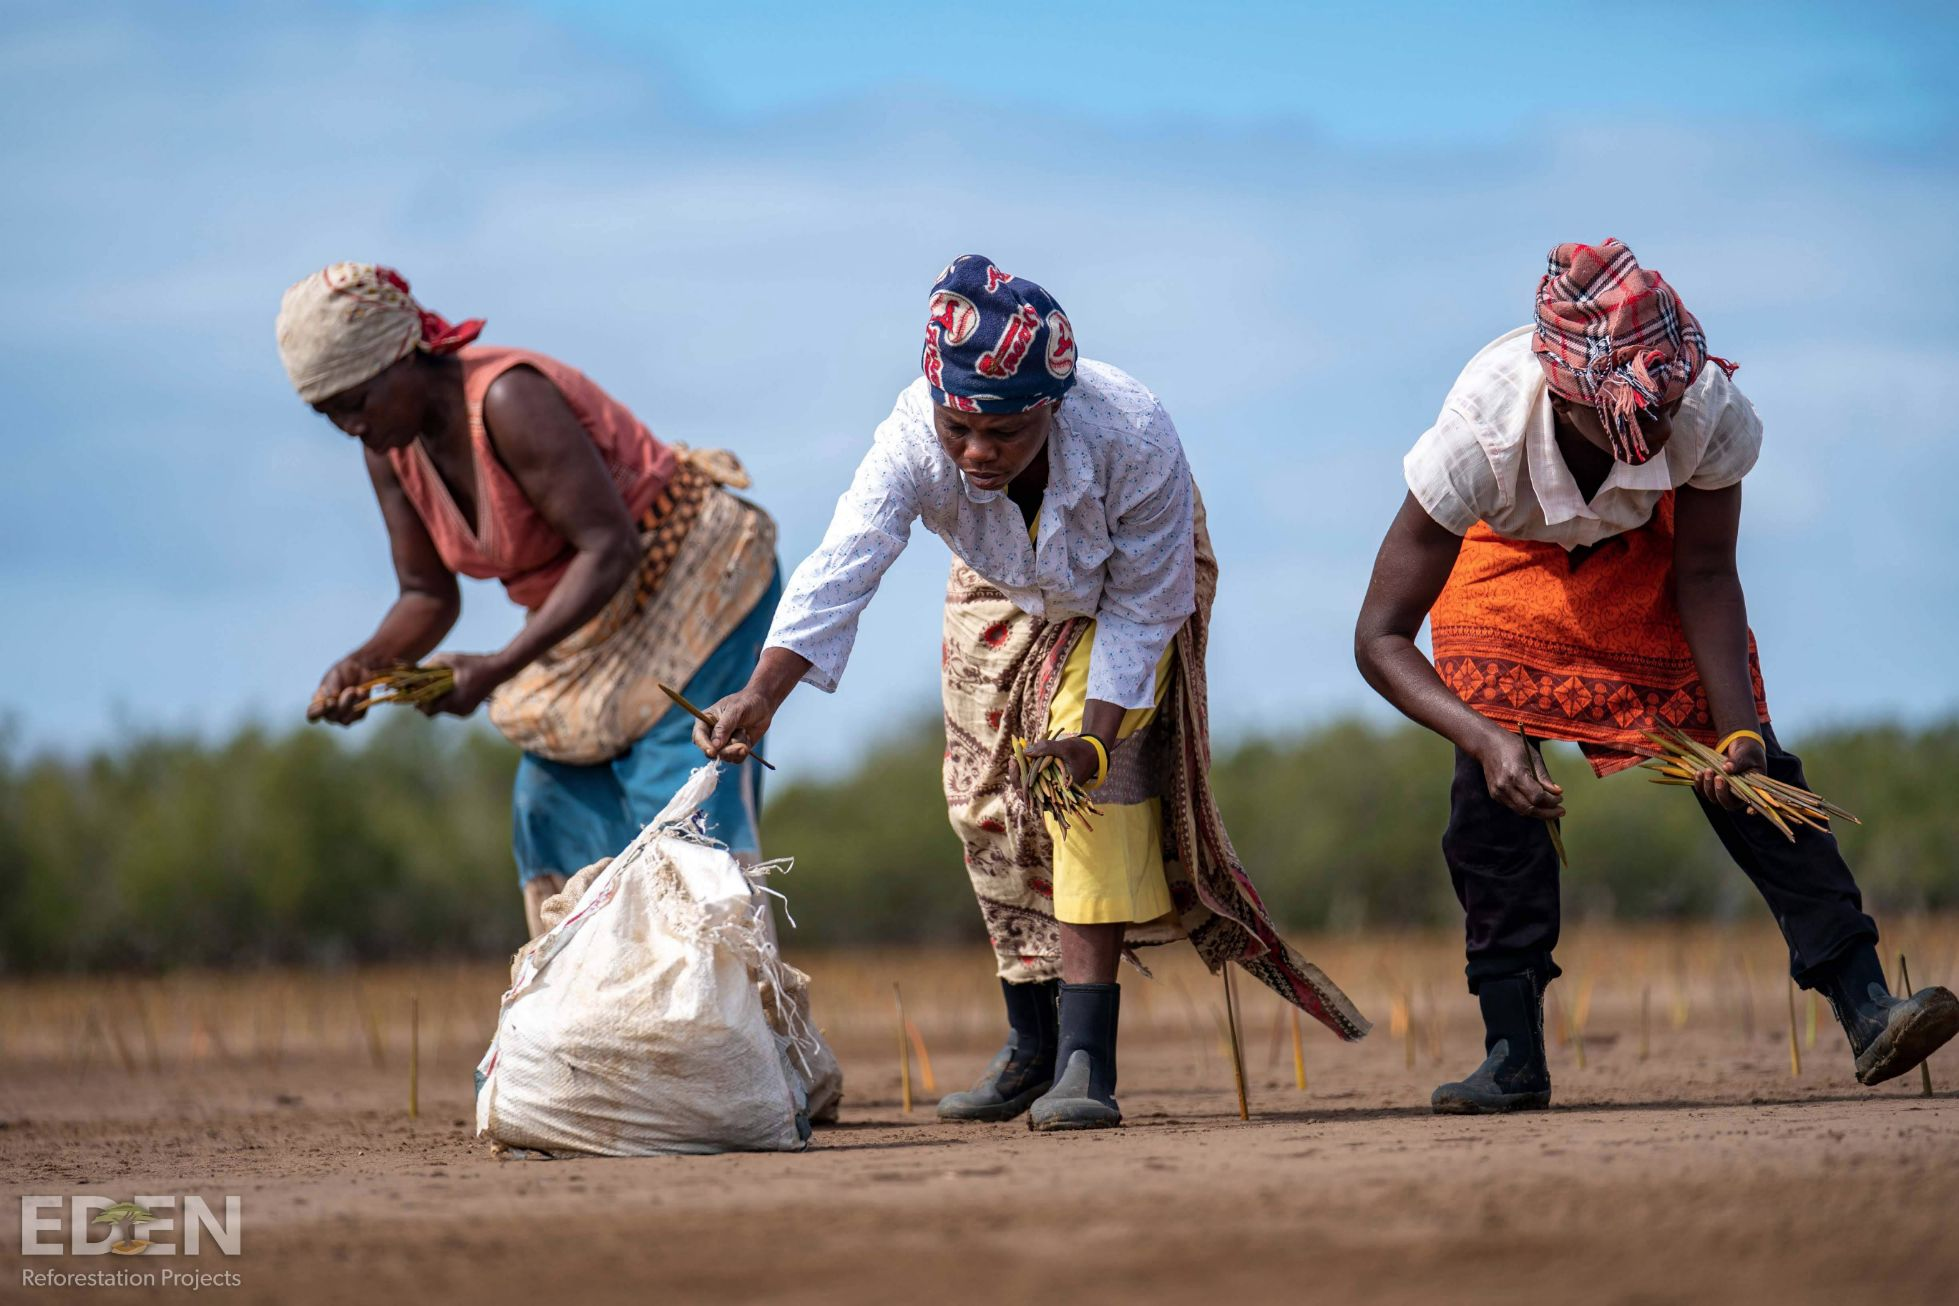 20190822 mozambique 0347wm